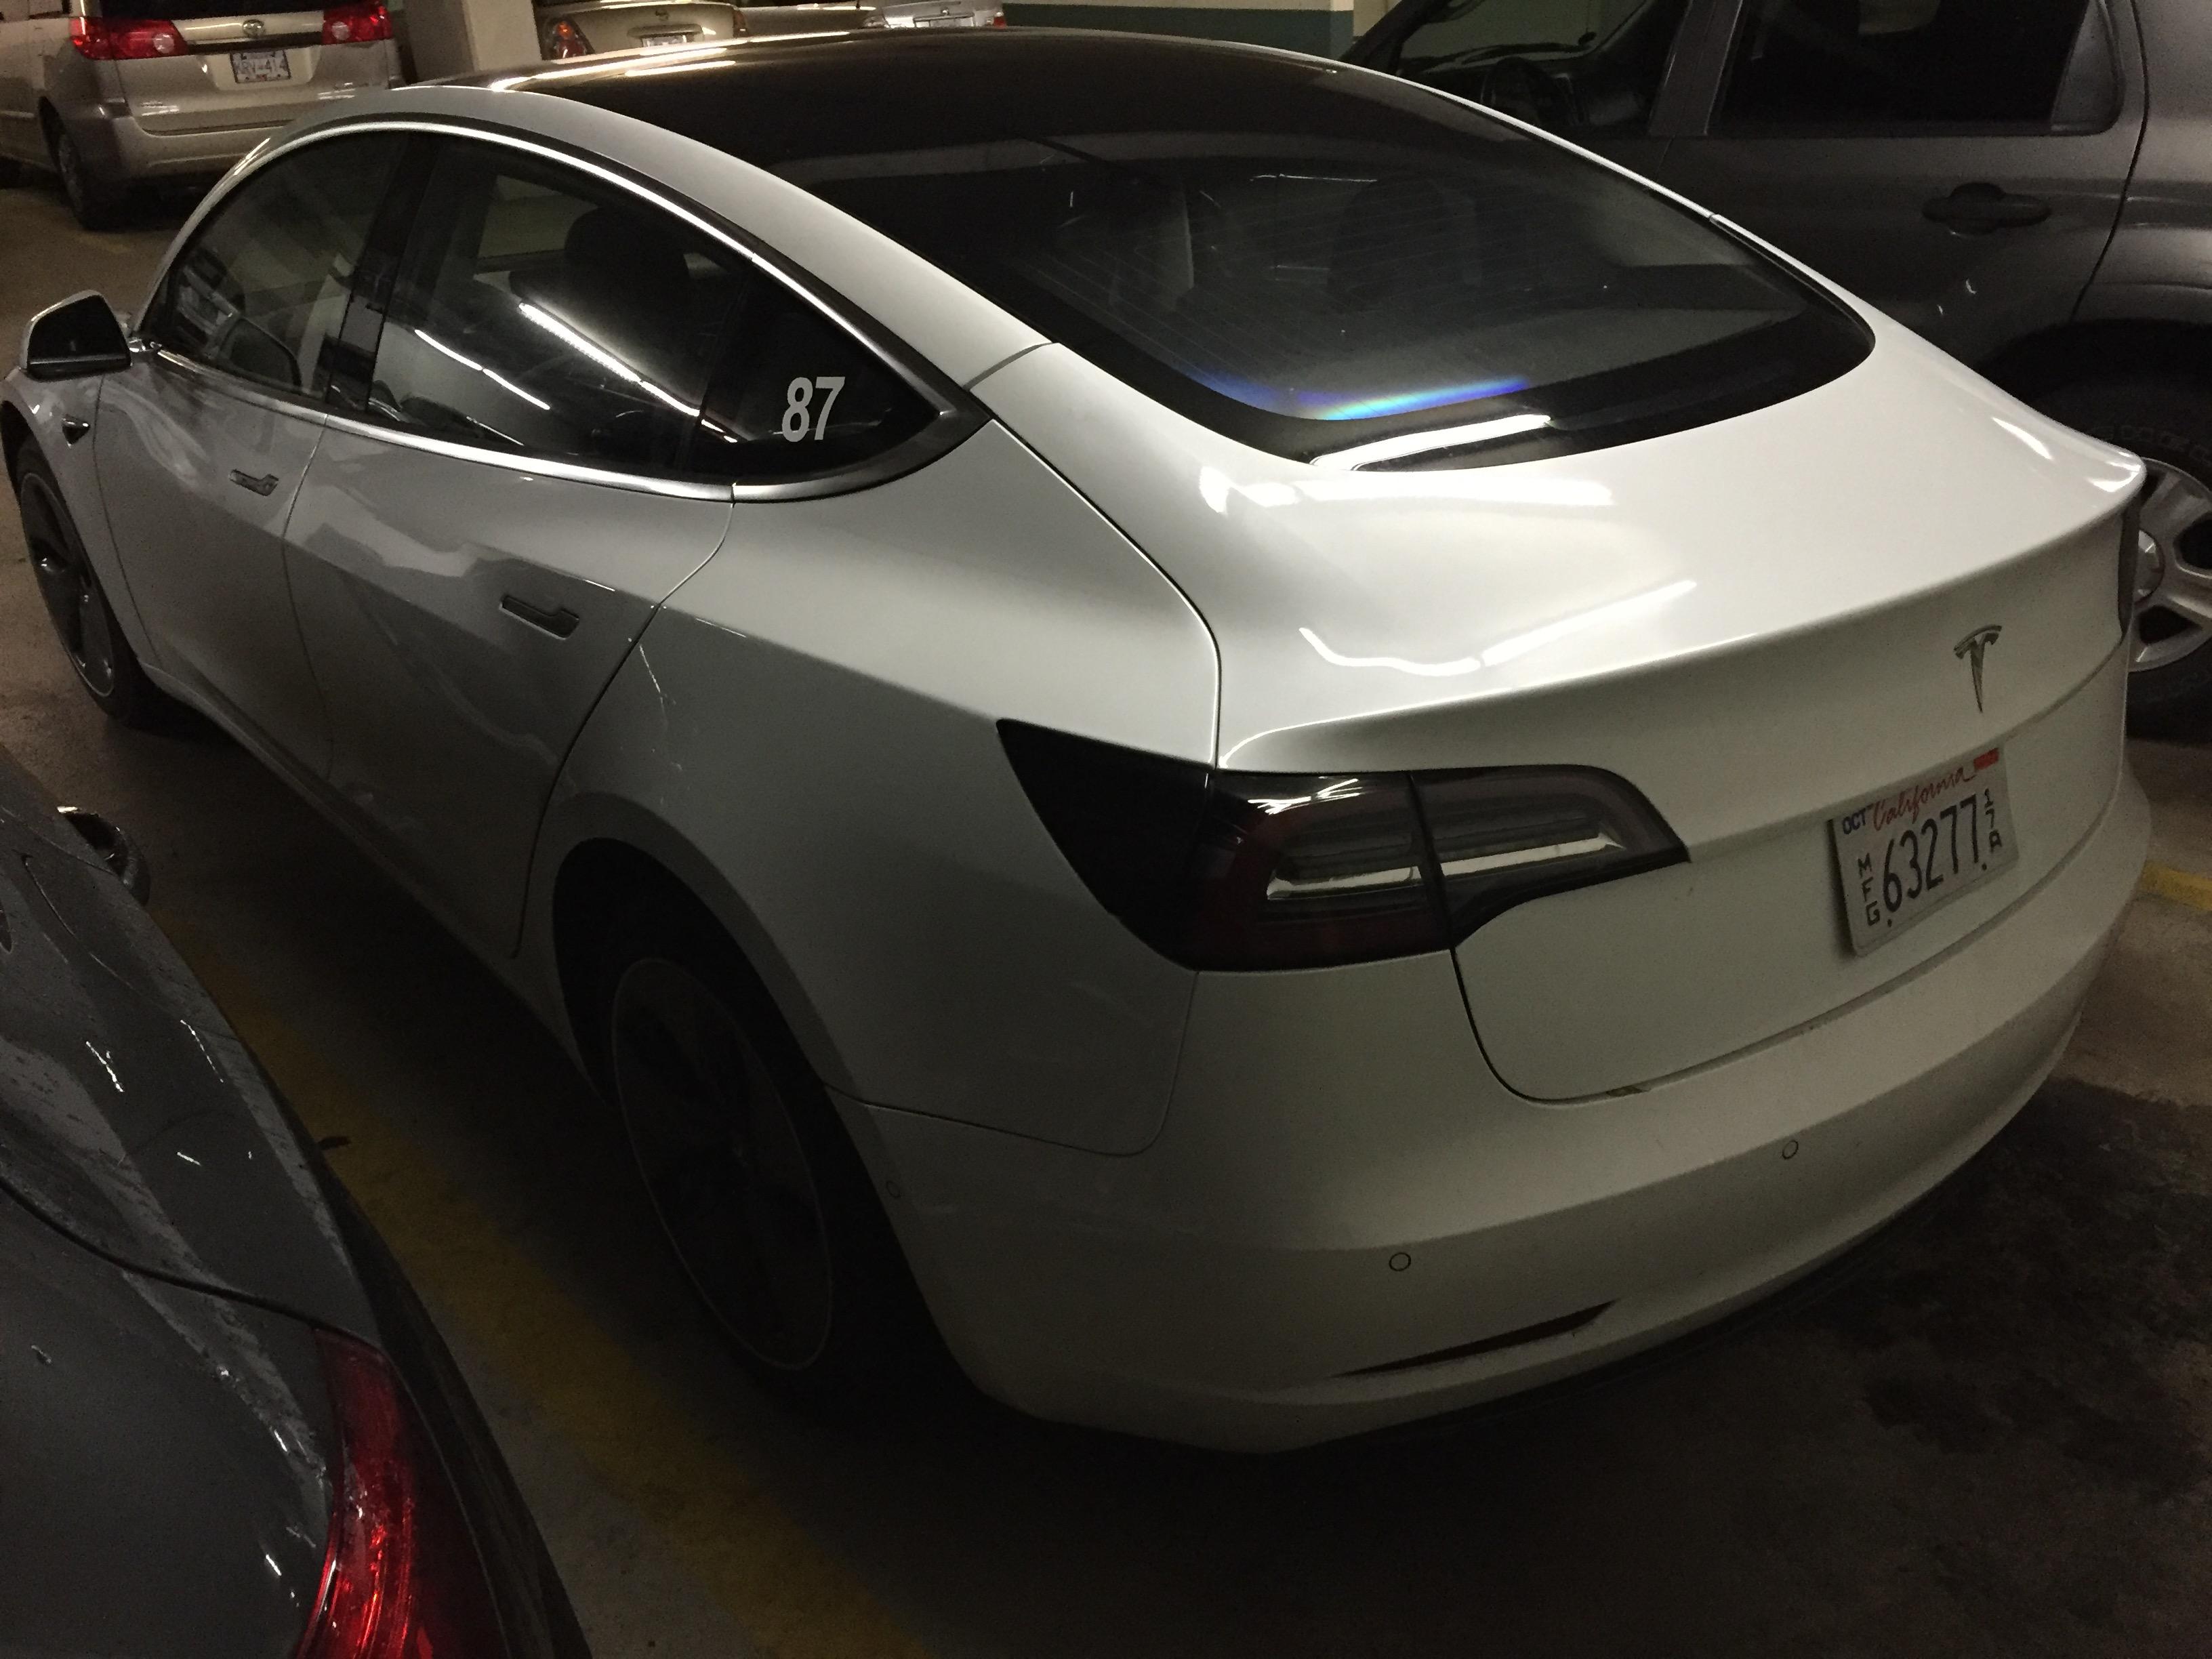 White Tesla Model 3 Rc 87 Vancouver 4